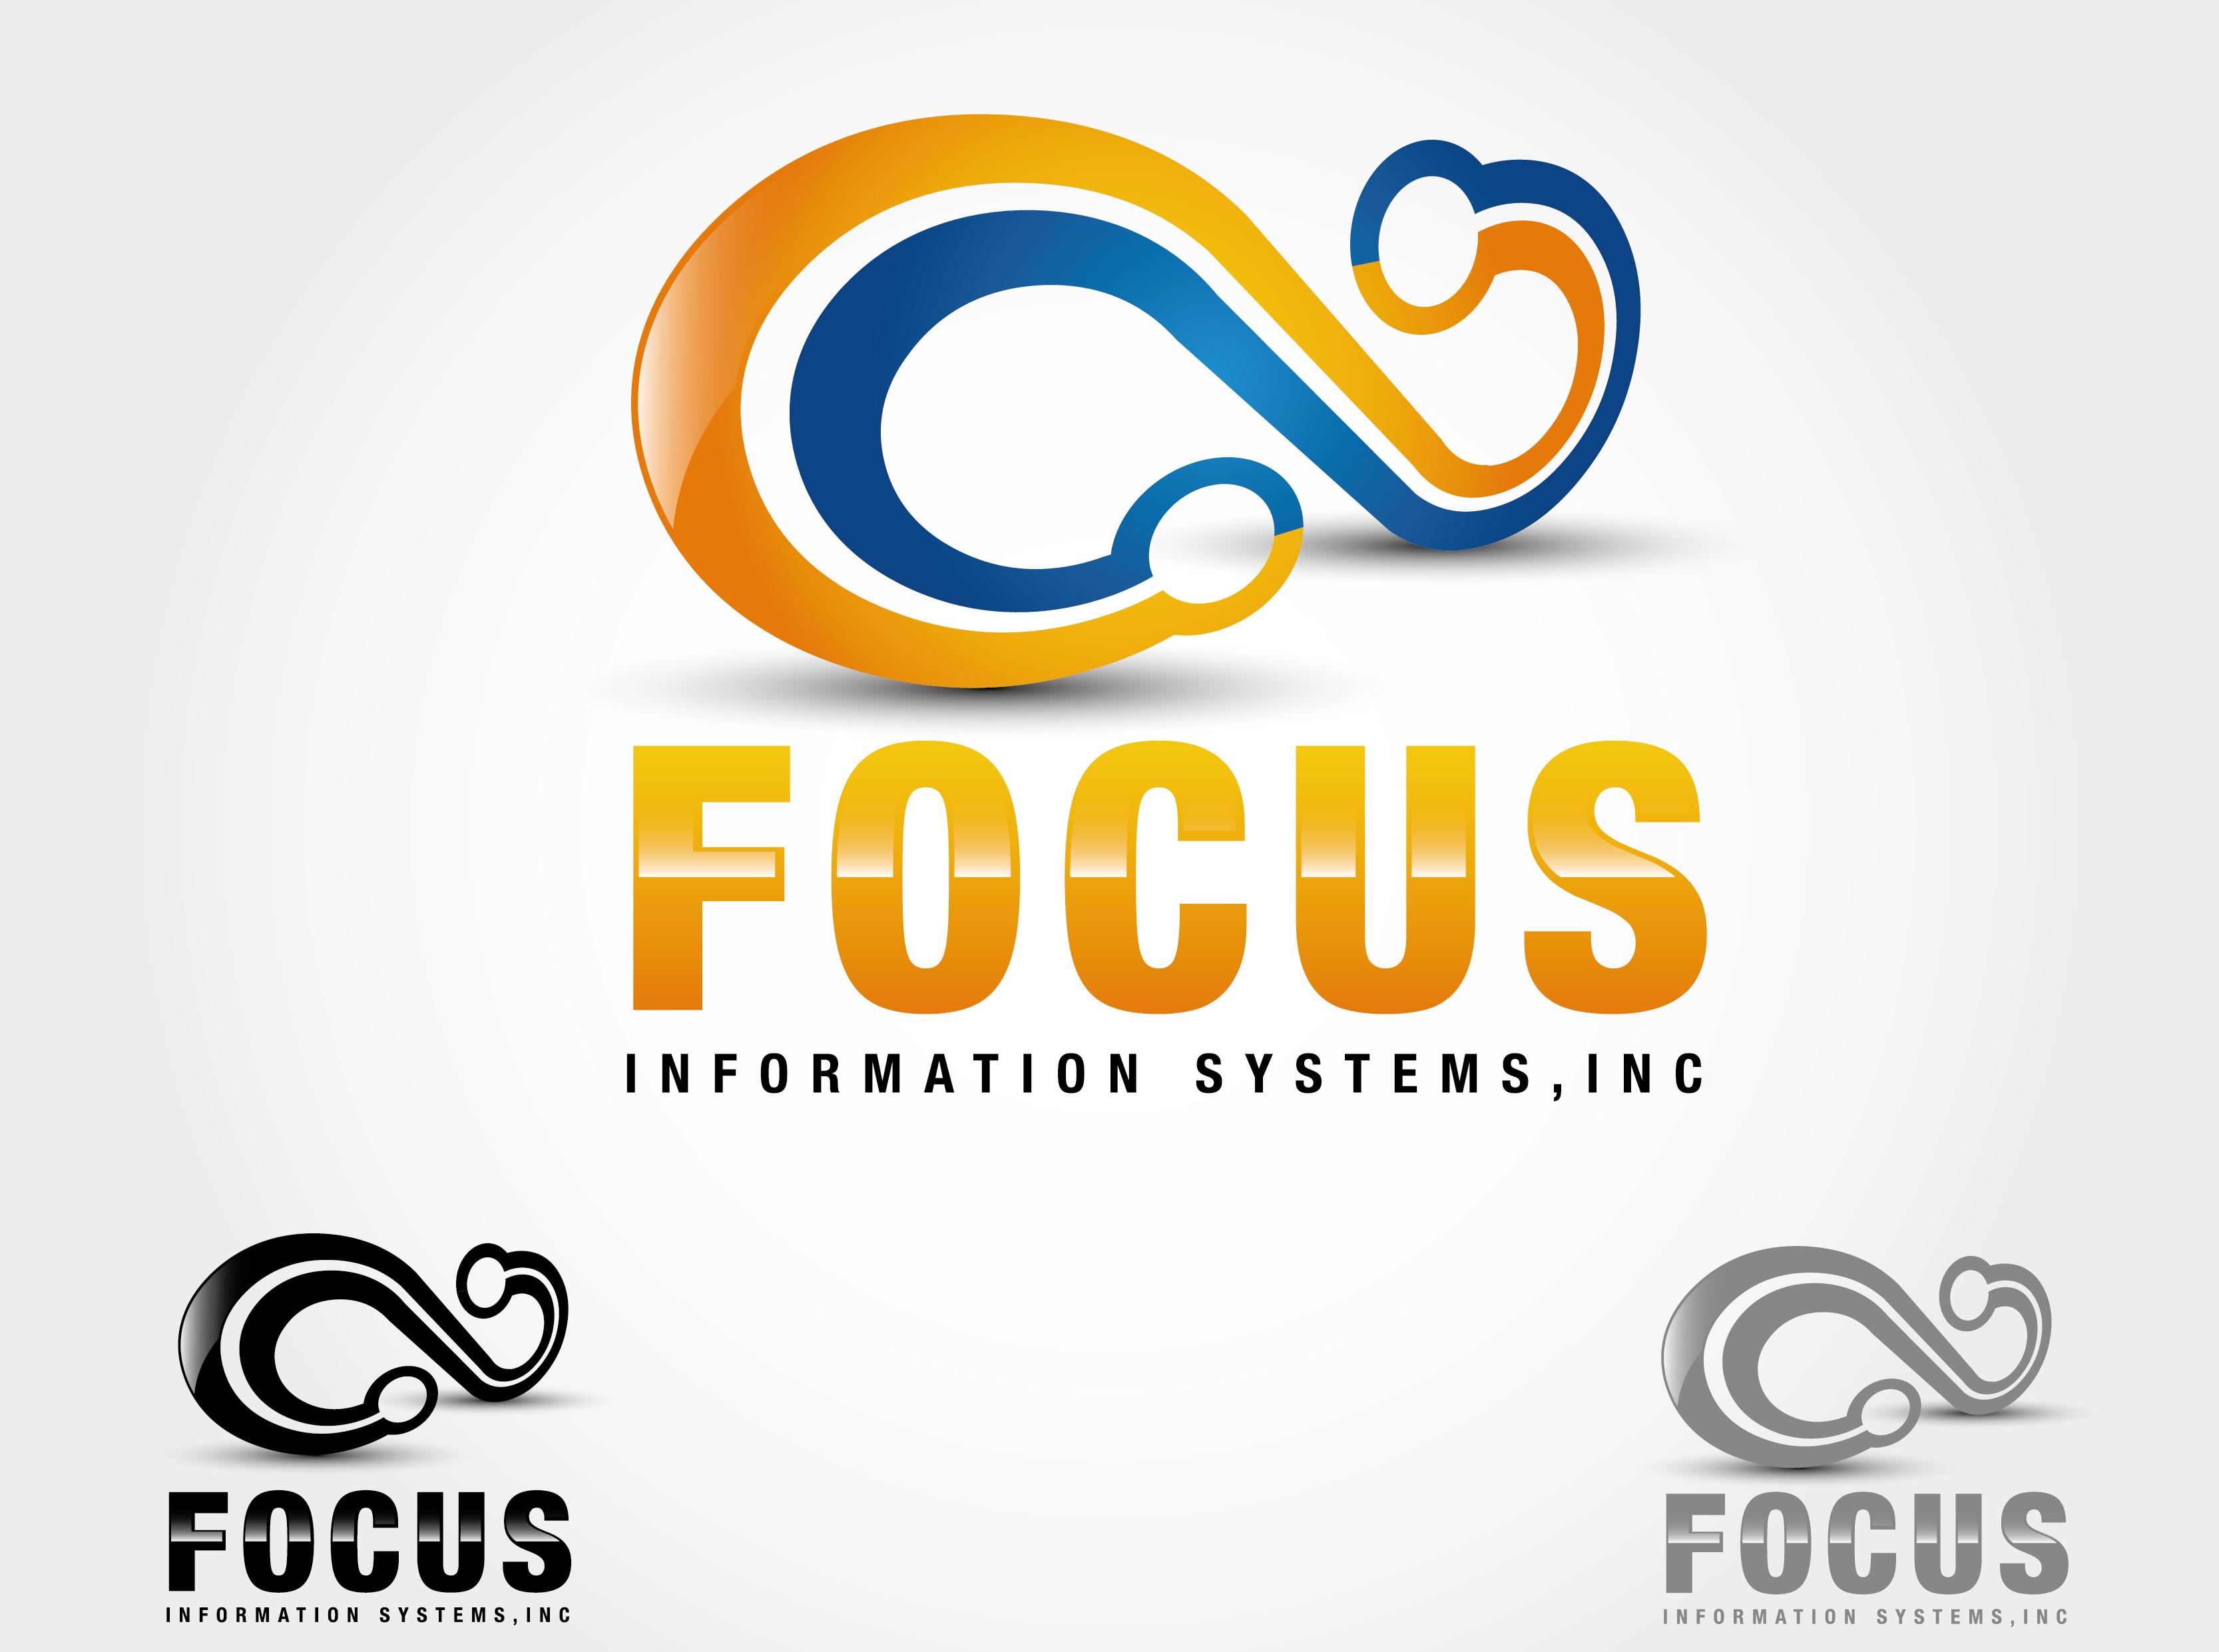 Logo Design by VENTSISLAV KOVACHEV - Entry No. 68 in the Logo Design Contest Artistic Logo Design for Focus Information Systems, Inc..